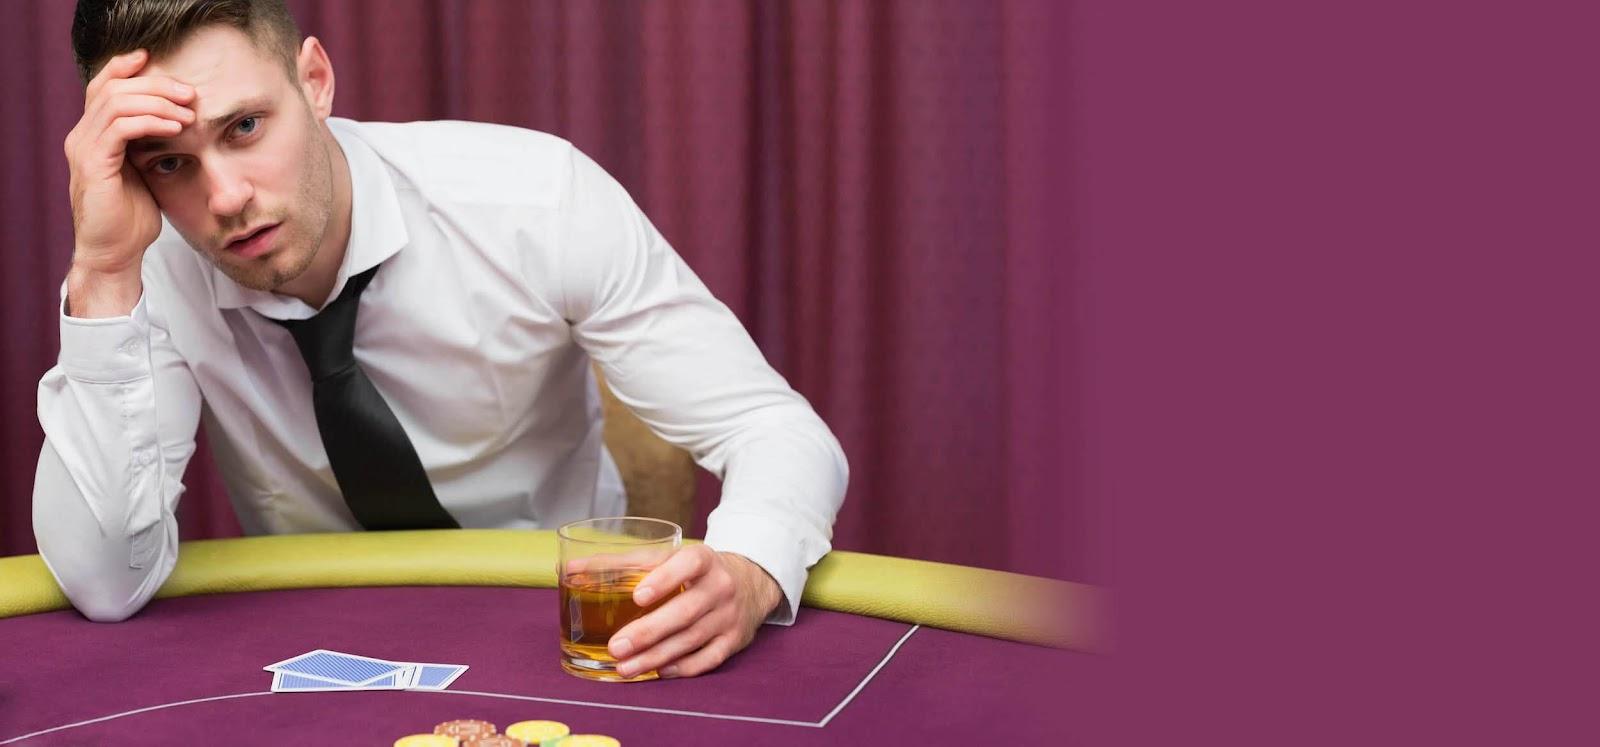 C:\Users\Korisnik\Desktop\gambling-addiction-problem.jpg